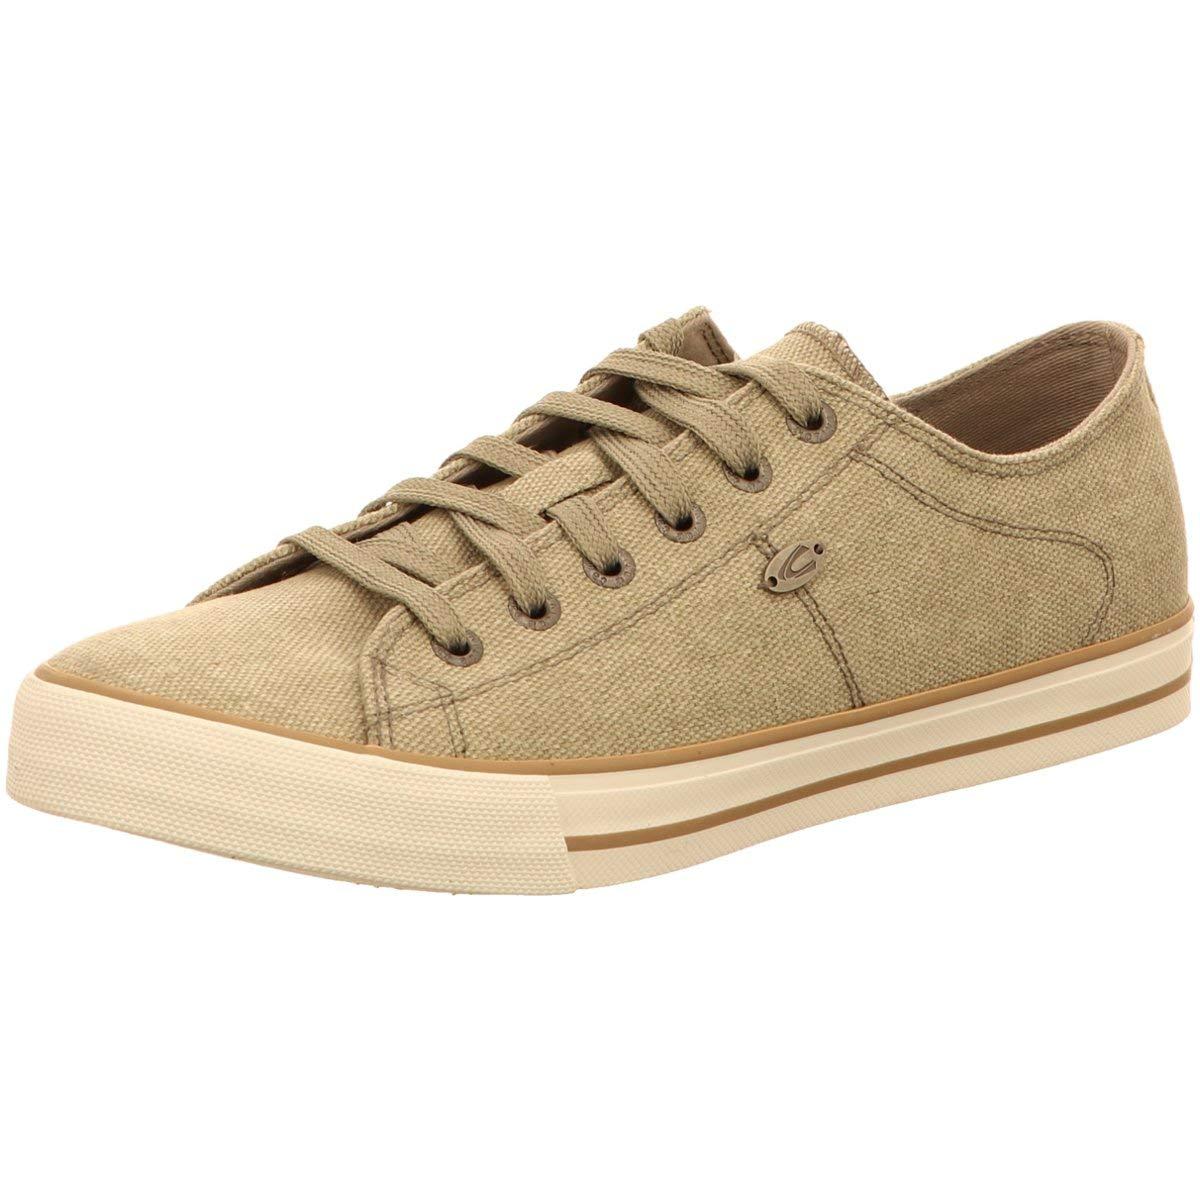 Camel active Damen Sneaker Beat 70 878.70.02 878.70.02 70 grau 489301 Grau 1897cf